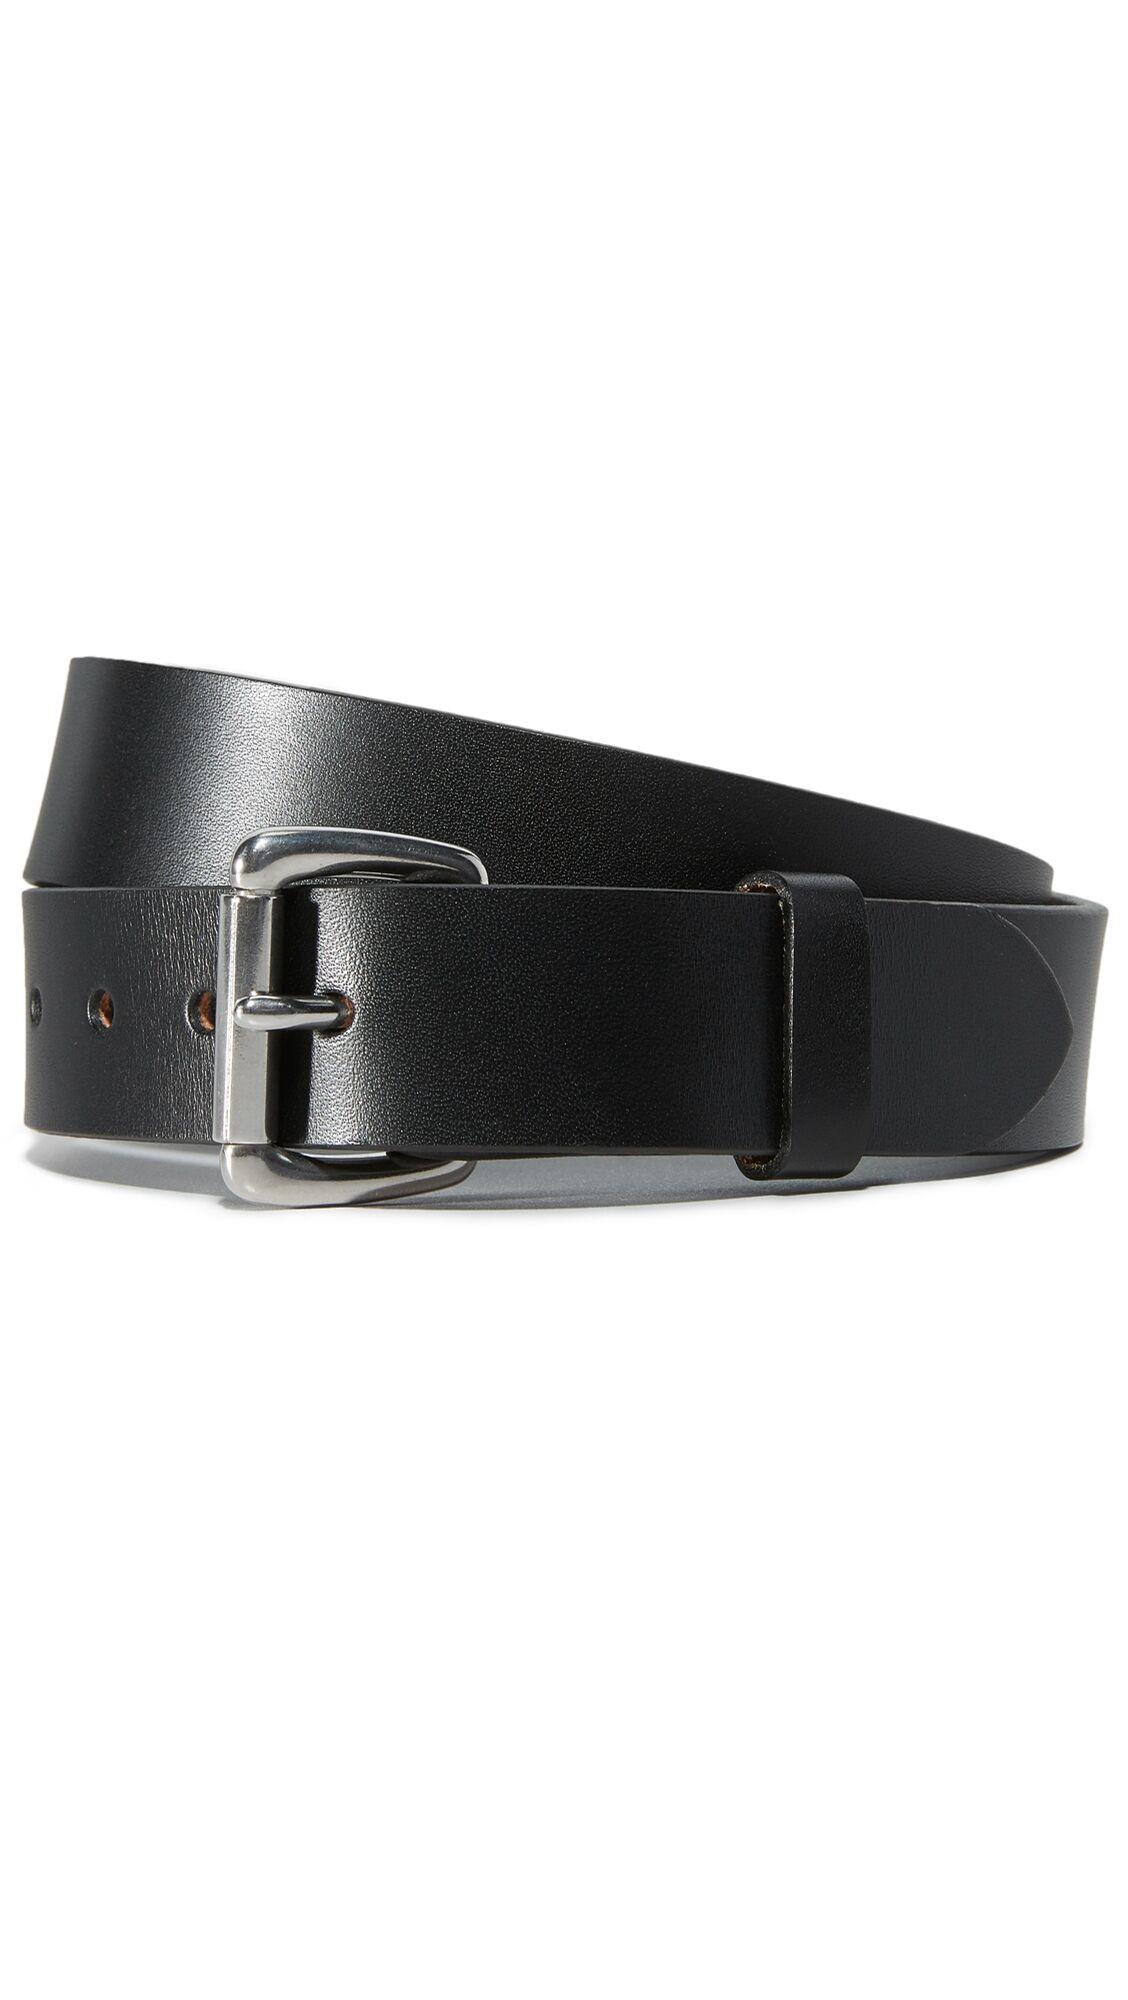 Filson Bridle Leather Belt - Black - Size: 30